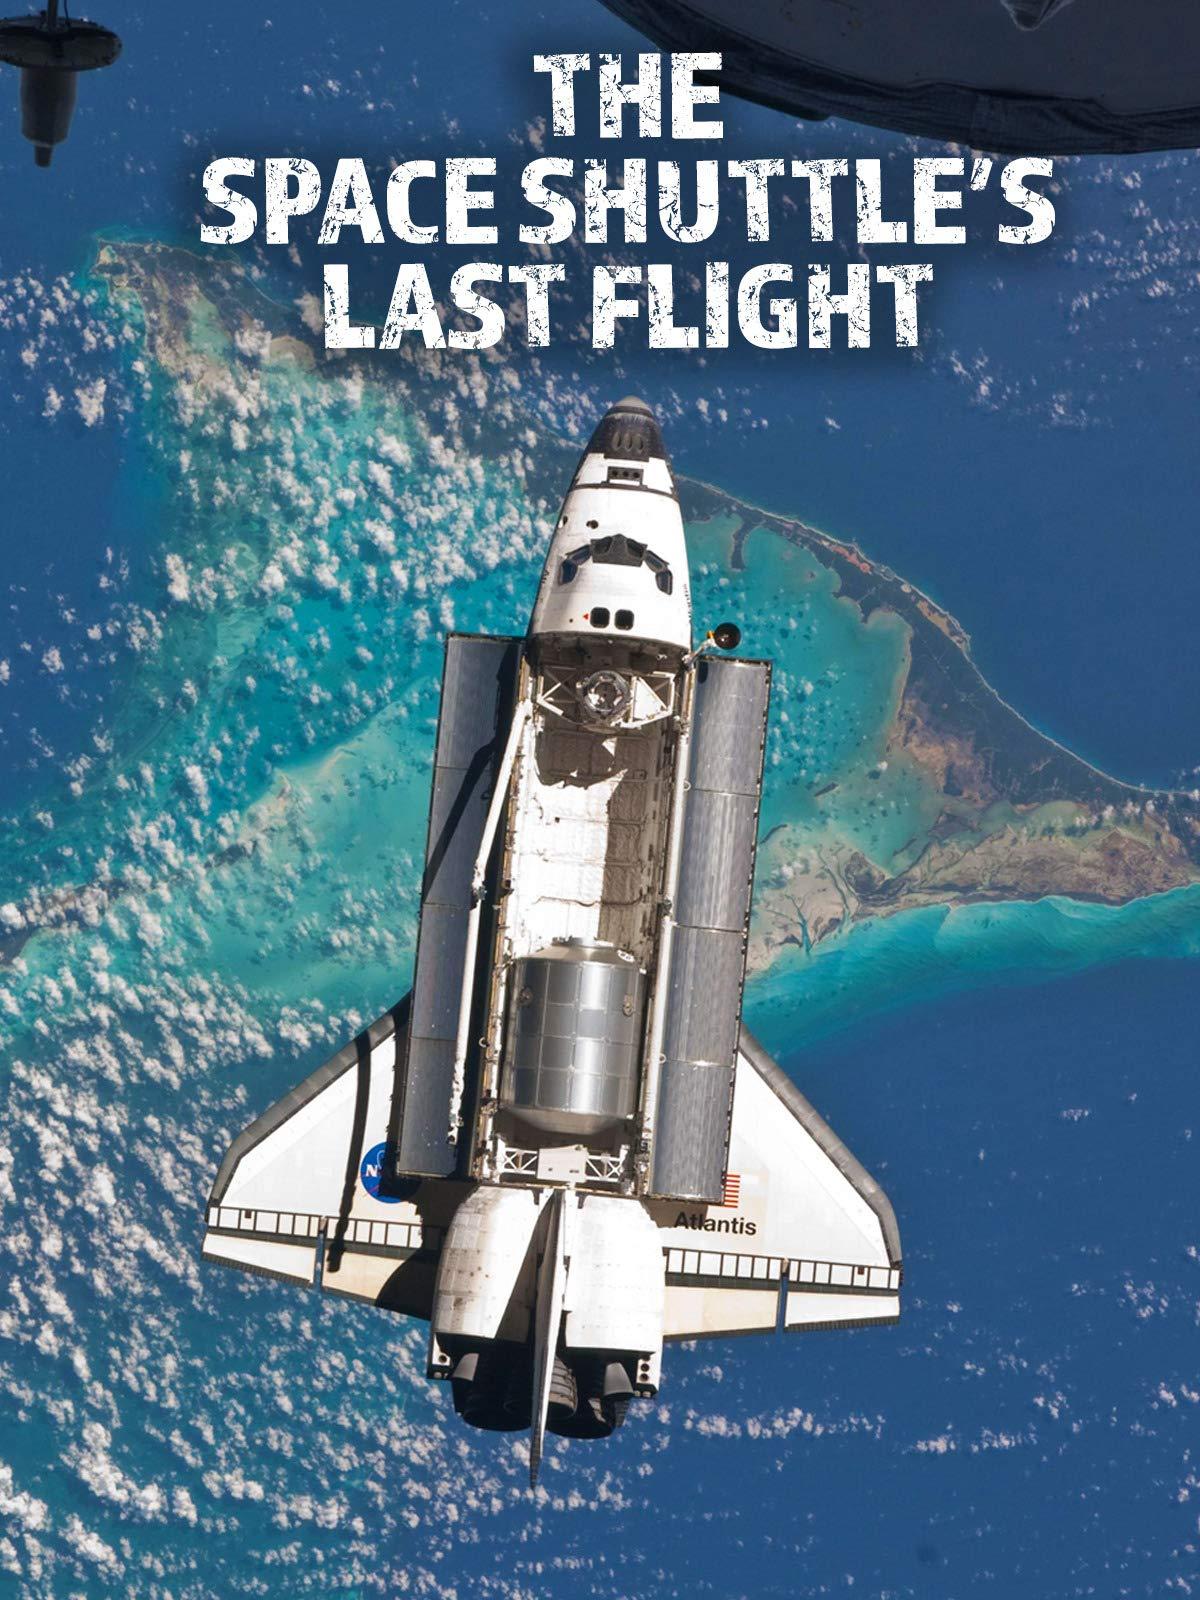 The Space Shuttle's Last Flight